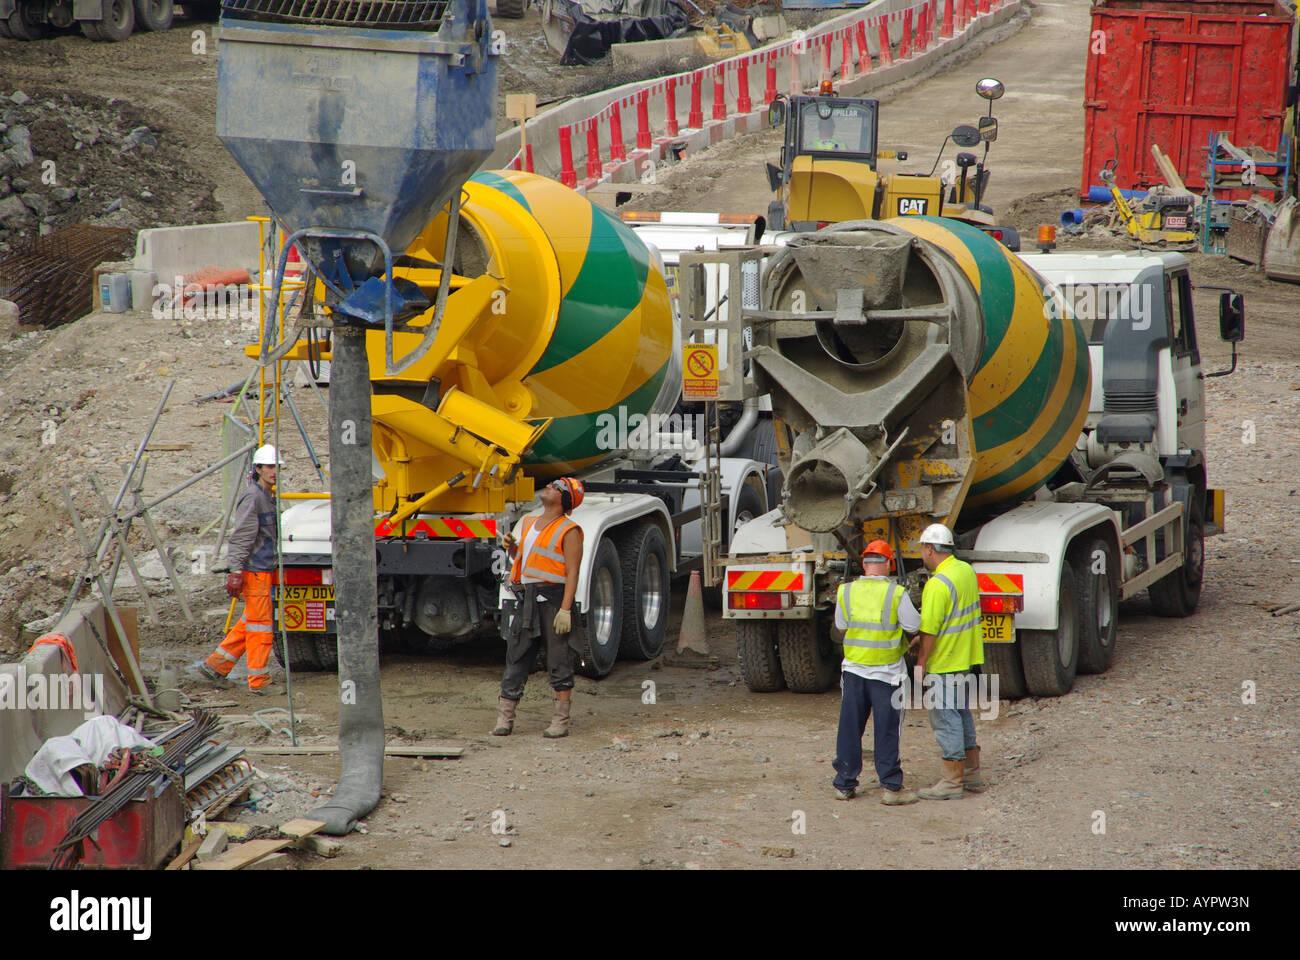 Readymix Lorry Stock Photos Amp Readymix Lorry Stock Images